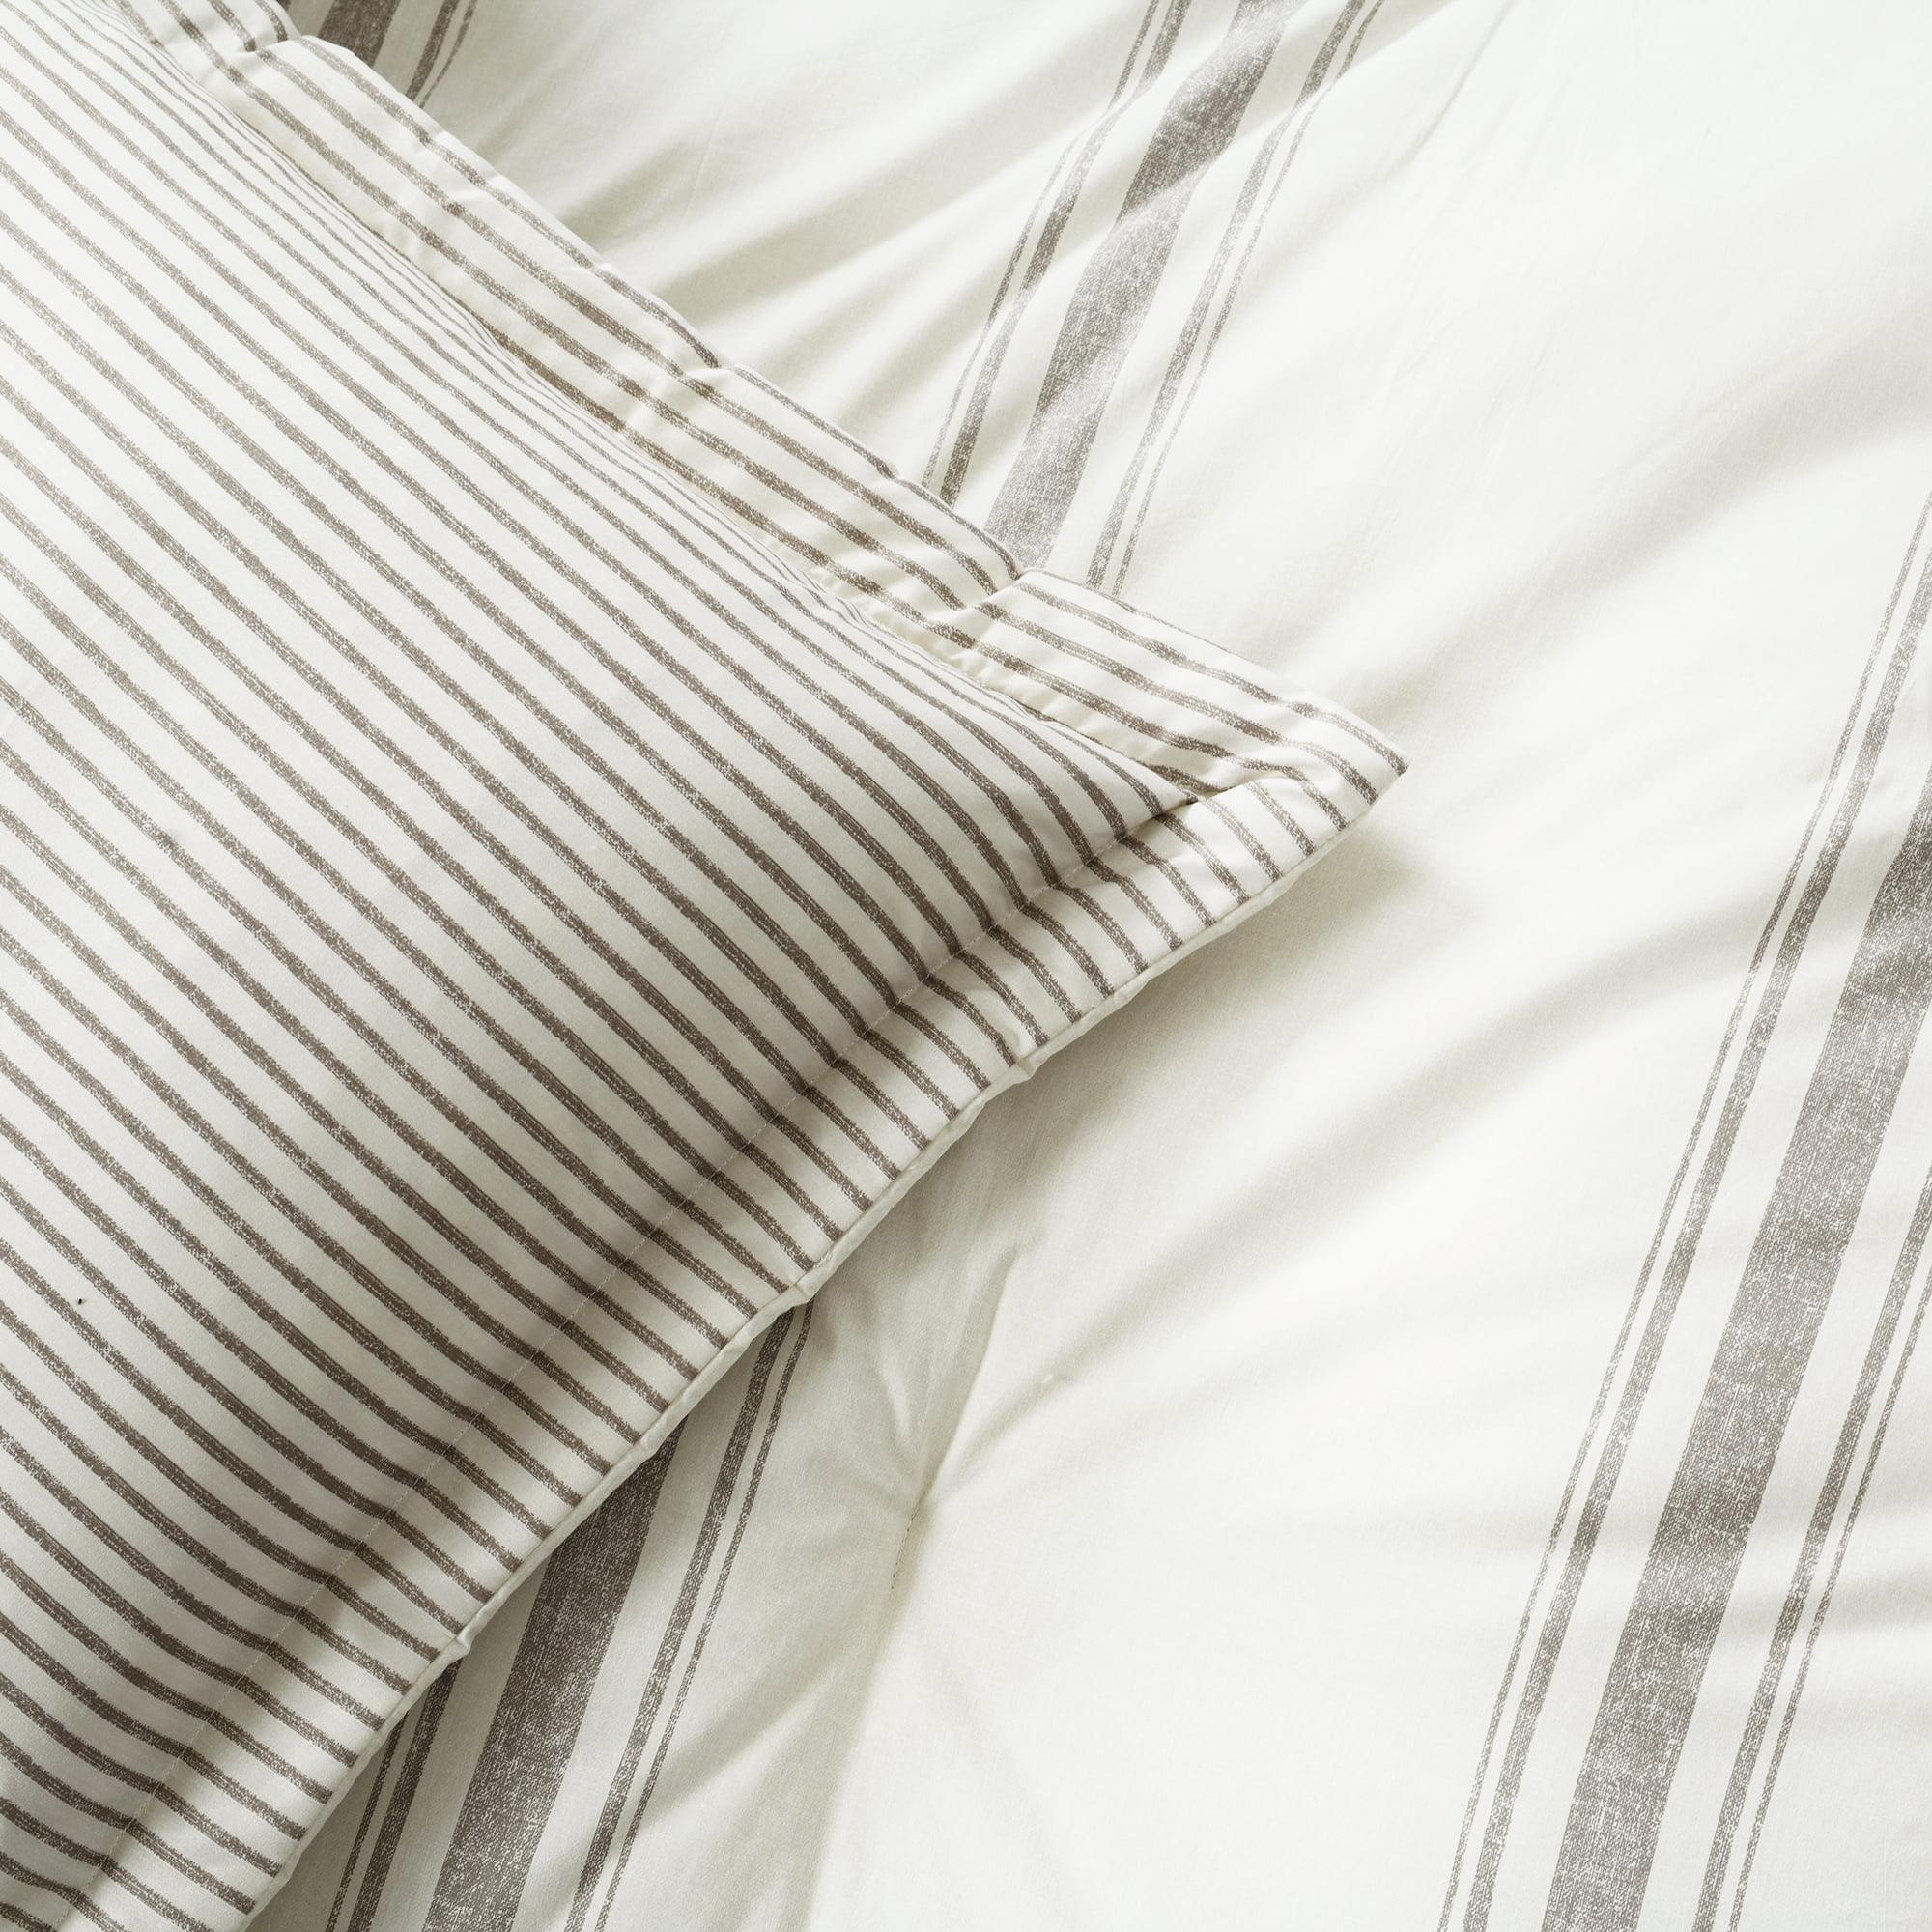 Lush Decor Farmhouse Grey Stripe 3 Piece Comforter Set Full Queen Walmart Com Walmart Com